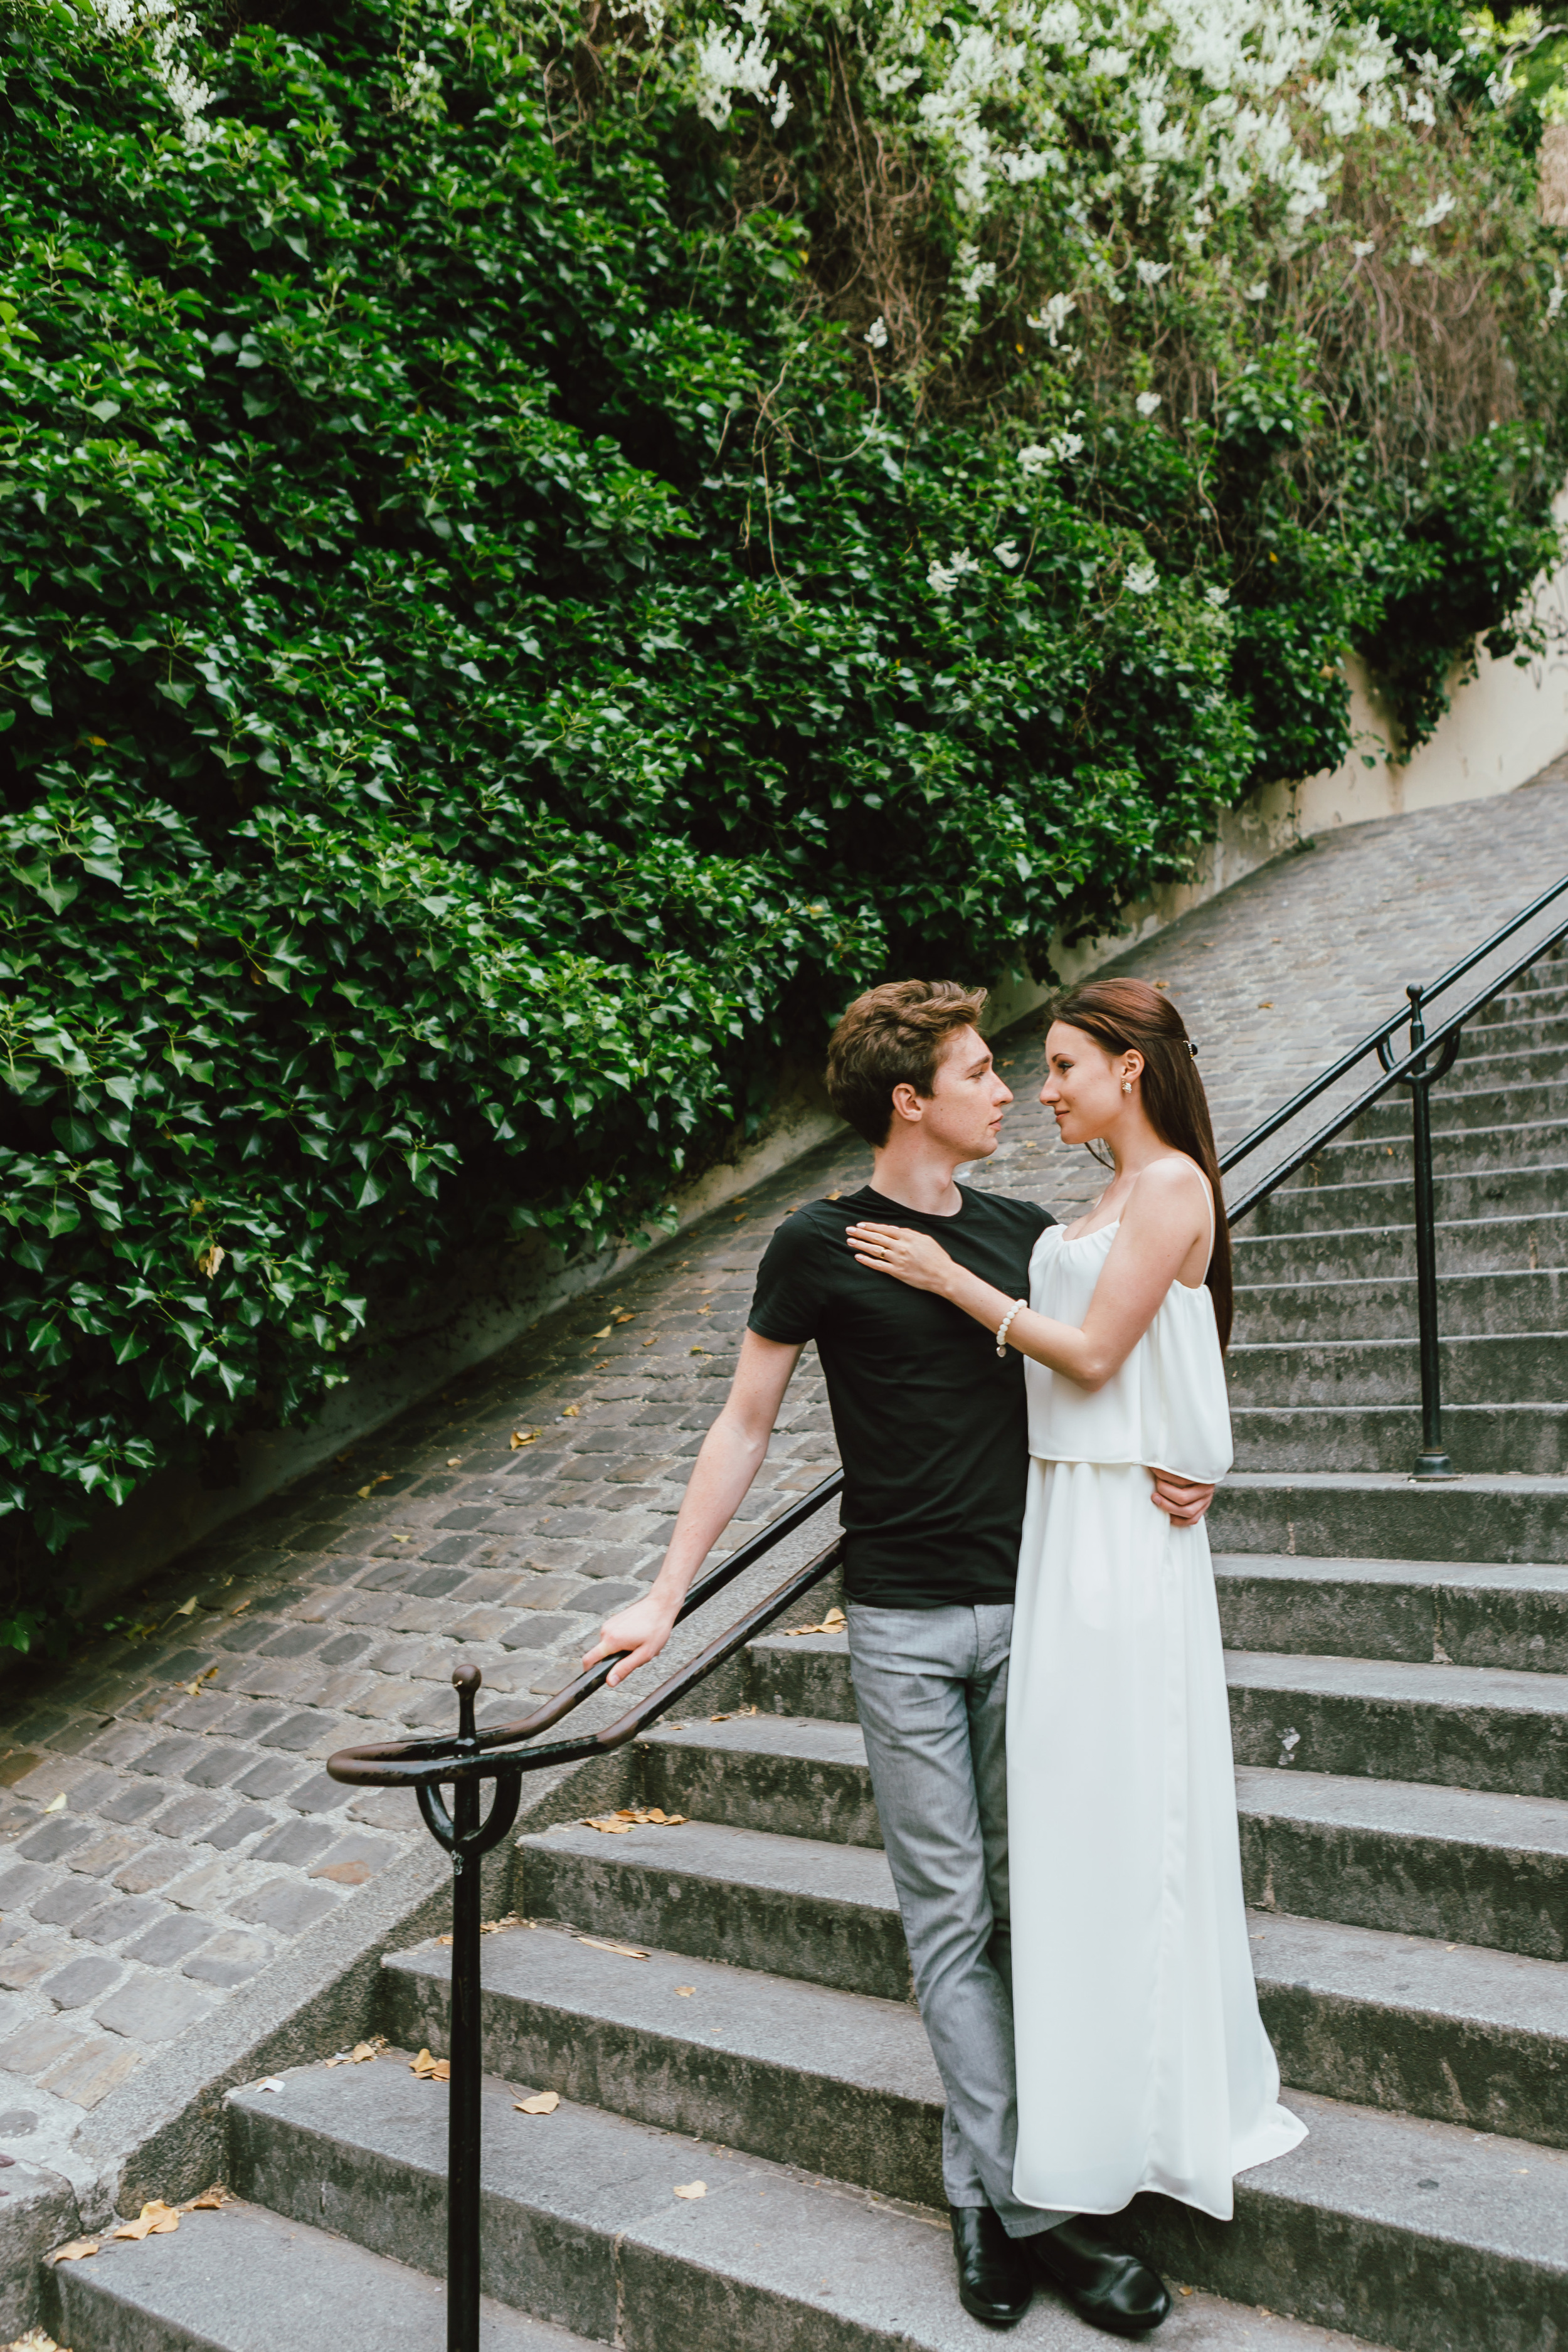 Paris-Photographer-Montmartre-Lovestory-France-stairs-hug-iheartparisfr.jpg